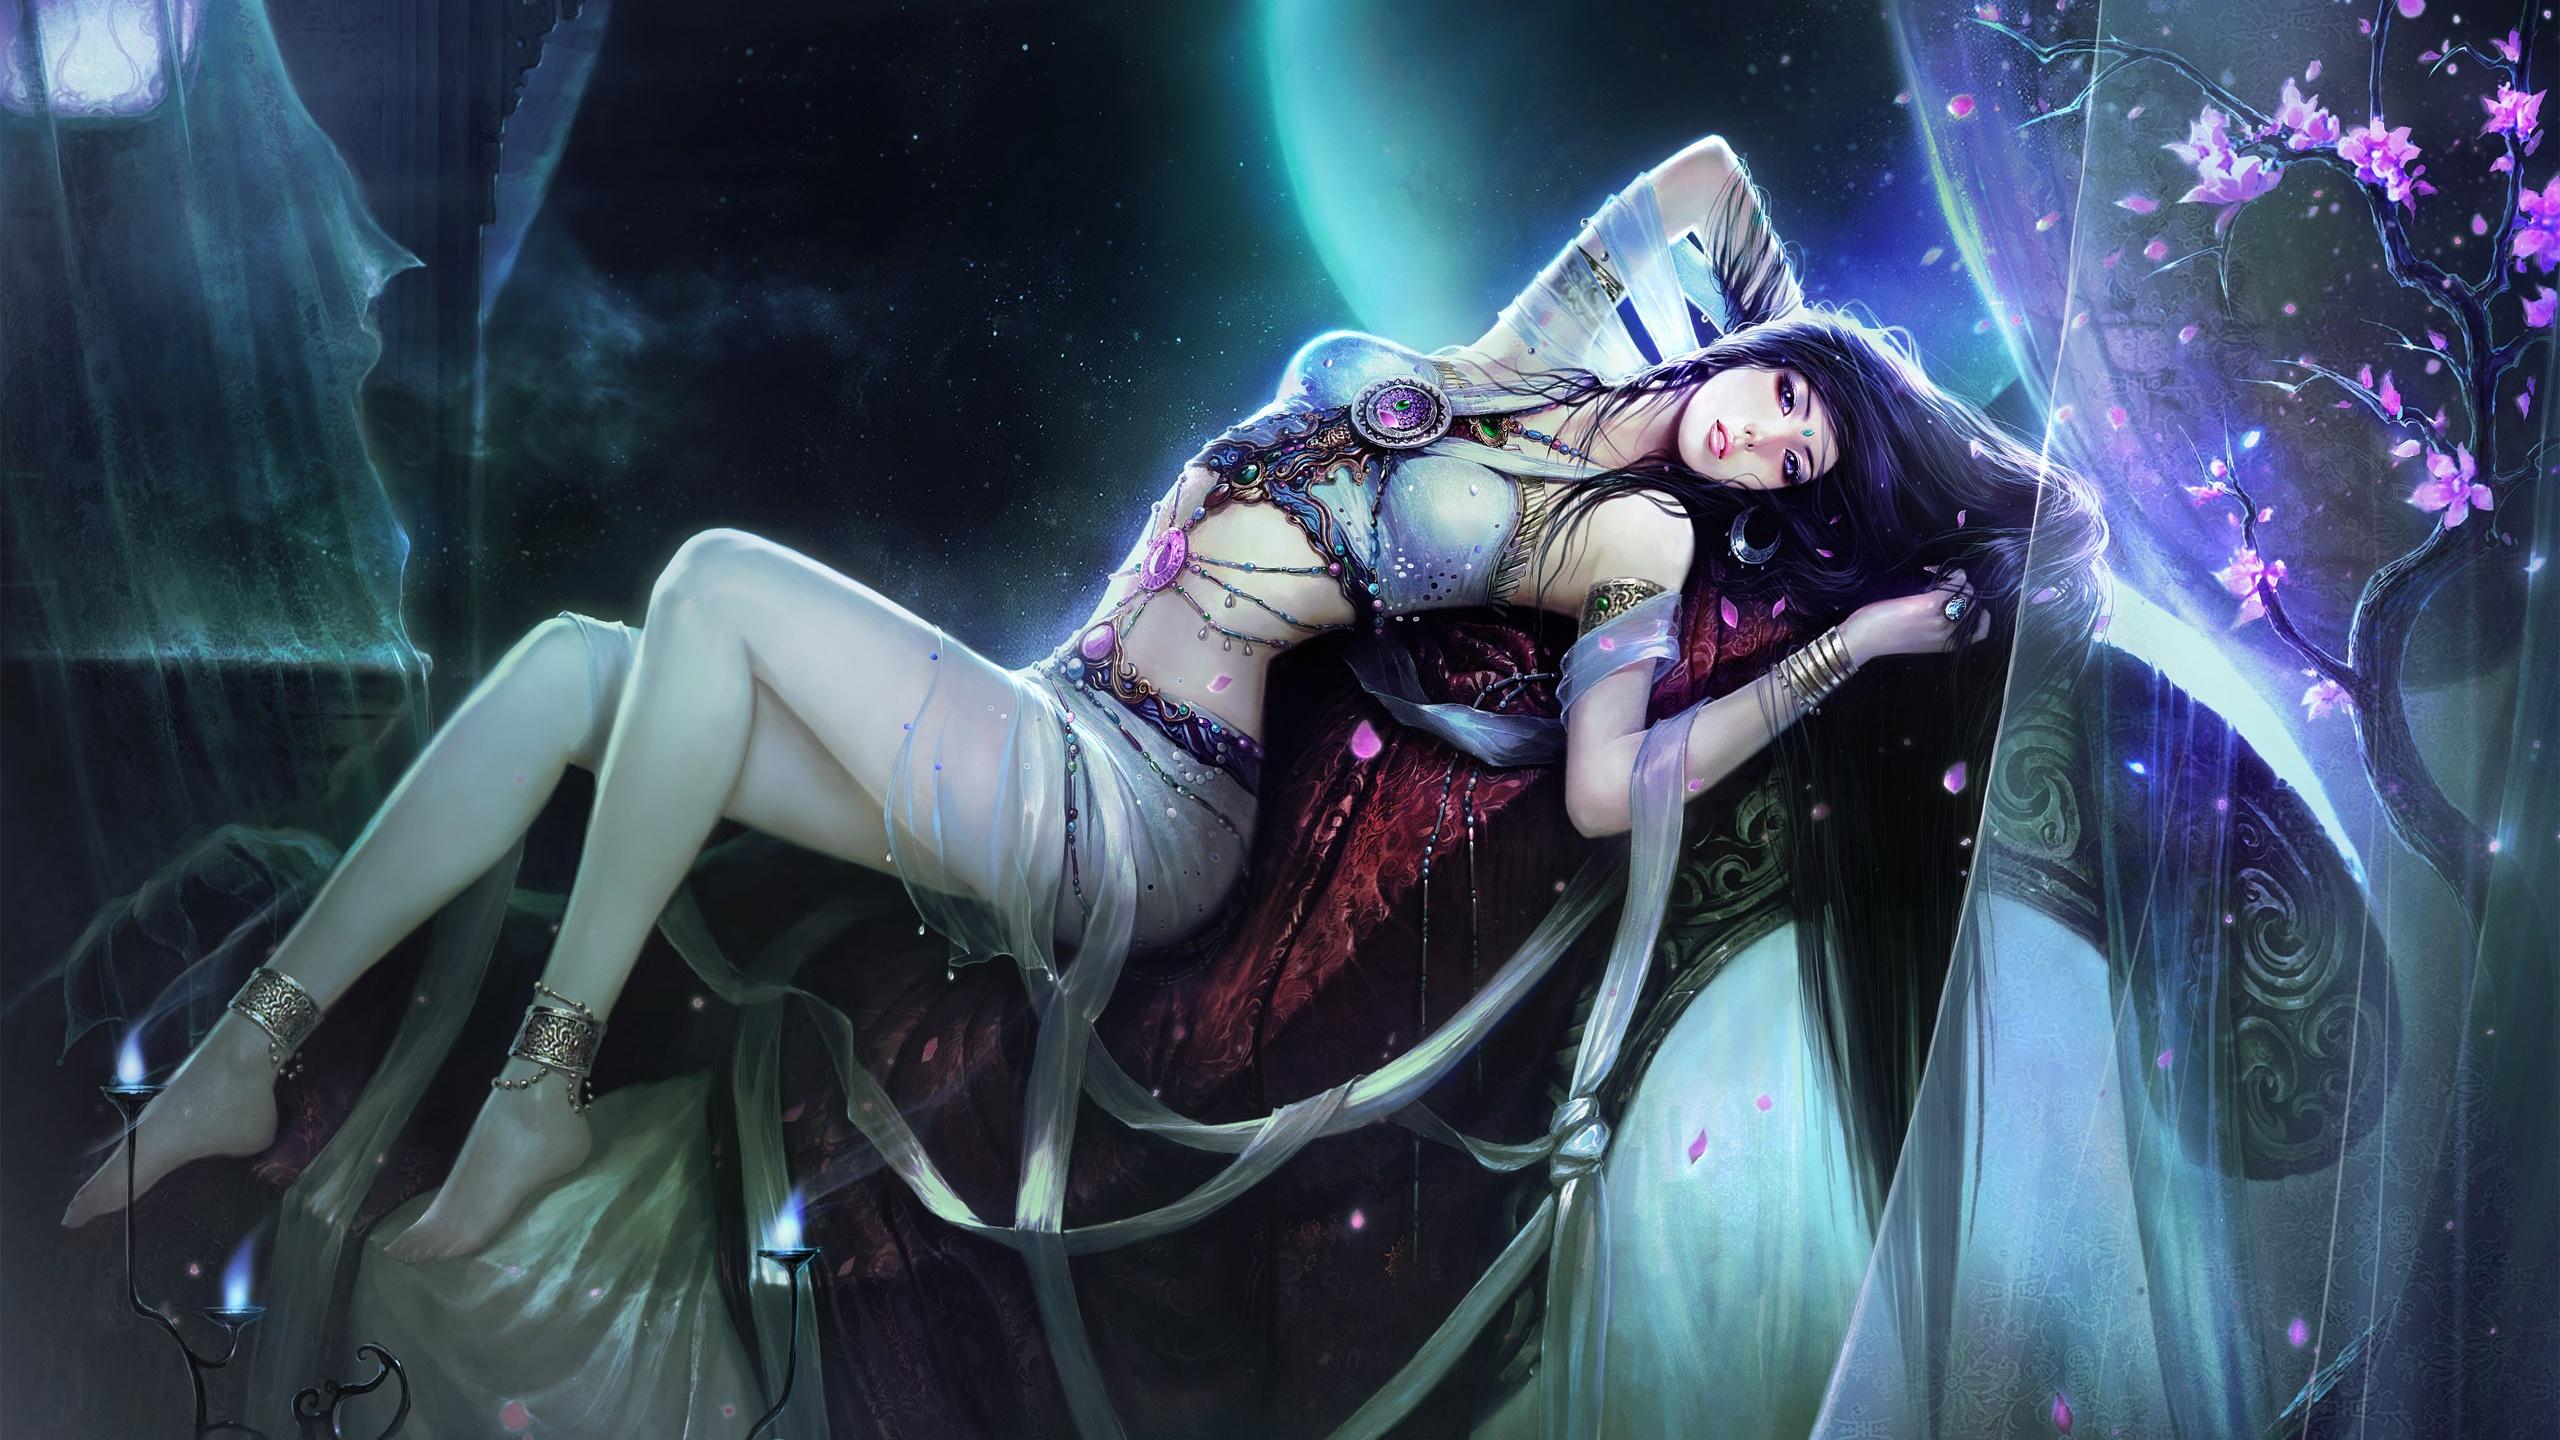 Beautiful Fantasy Girl Wallpapers HD Wallpapers 2560x1440